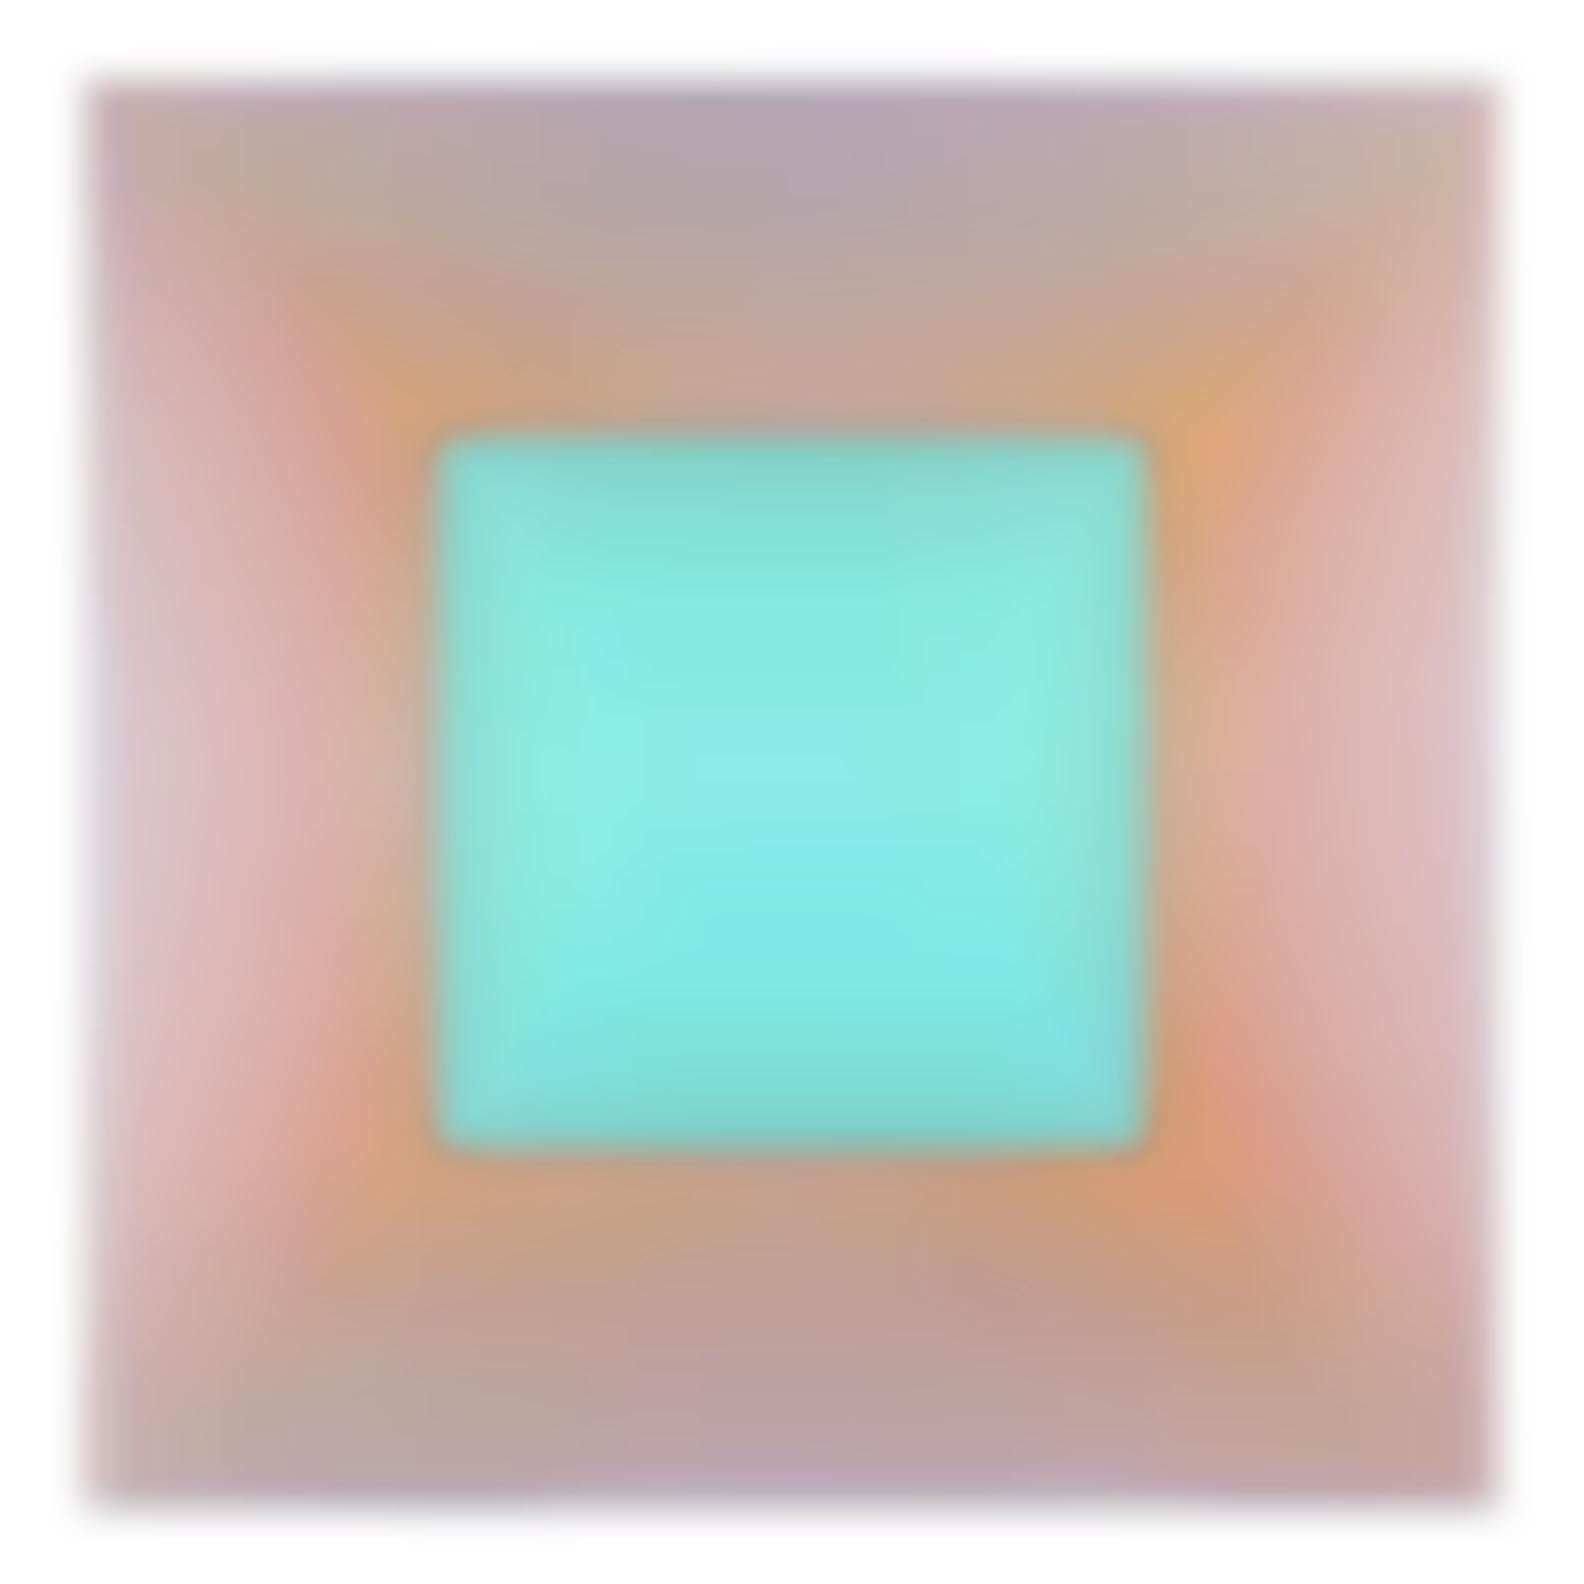 Richard Anuszkiewicz-Aqua Square-2016